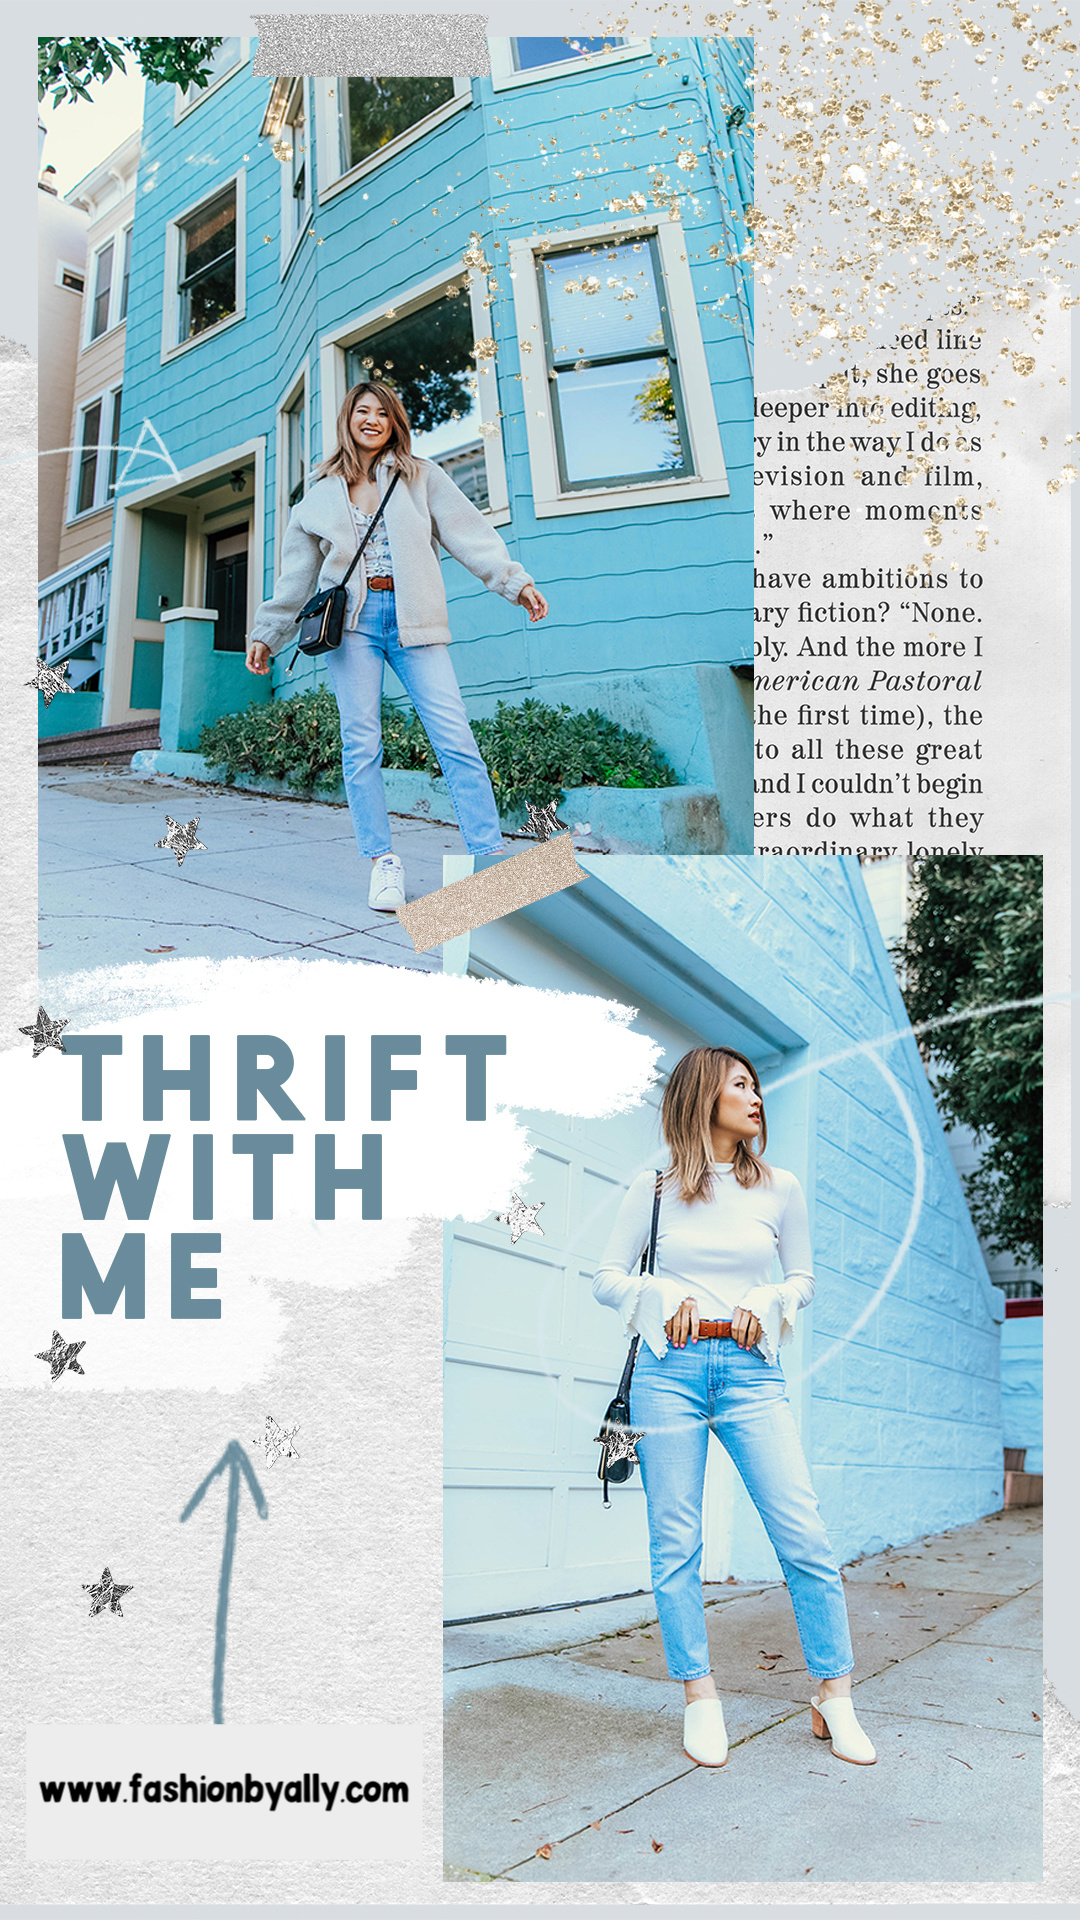 Thrift Store Shopping Tips and Tricks.jpg